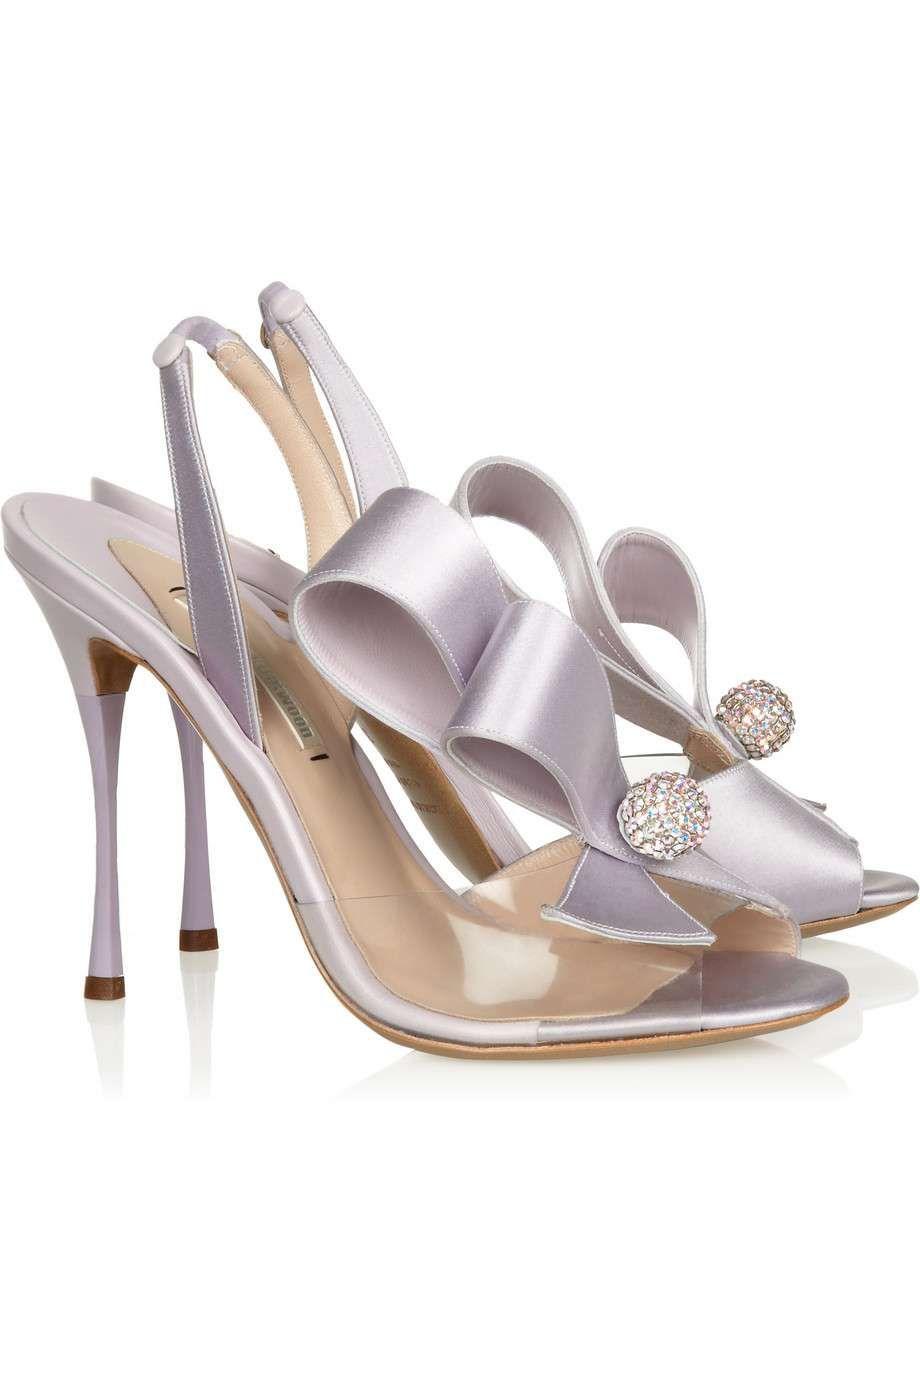 Nicholas Kirkwood Satin Bow-Accented Sandals cheap sale best sale e9cP1YeKxv